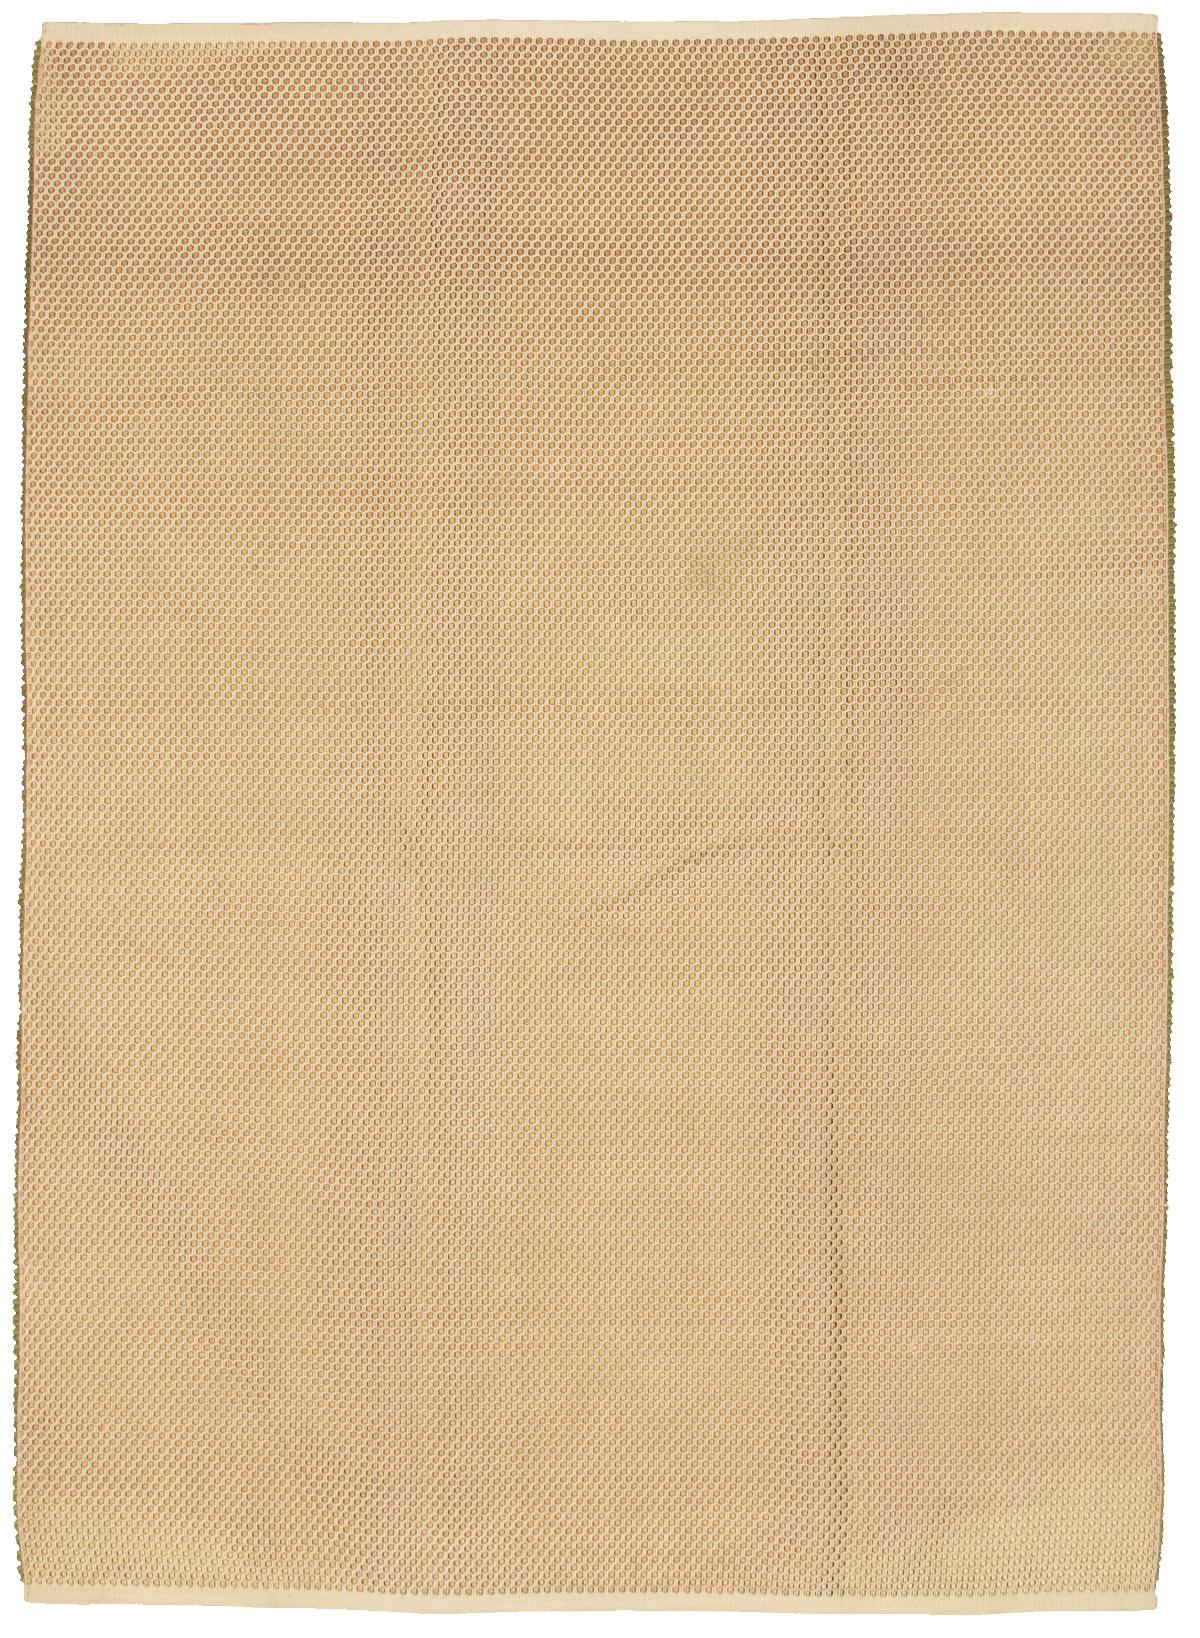 "Handmade Honeycomb III Light Gold Cotton/Polyester Rug 8'1"" x 13'1"" Size: 8'1"" x 13'1"""